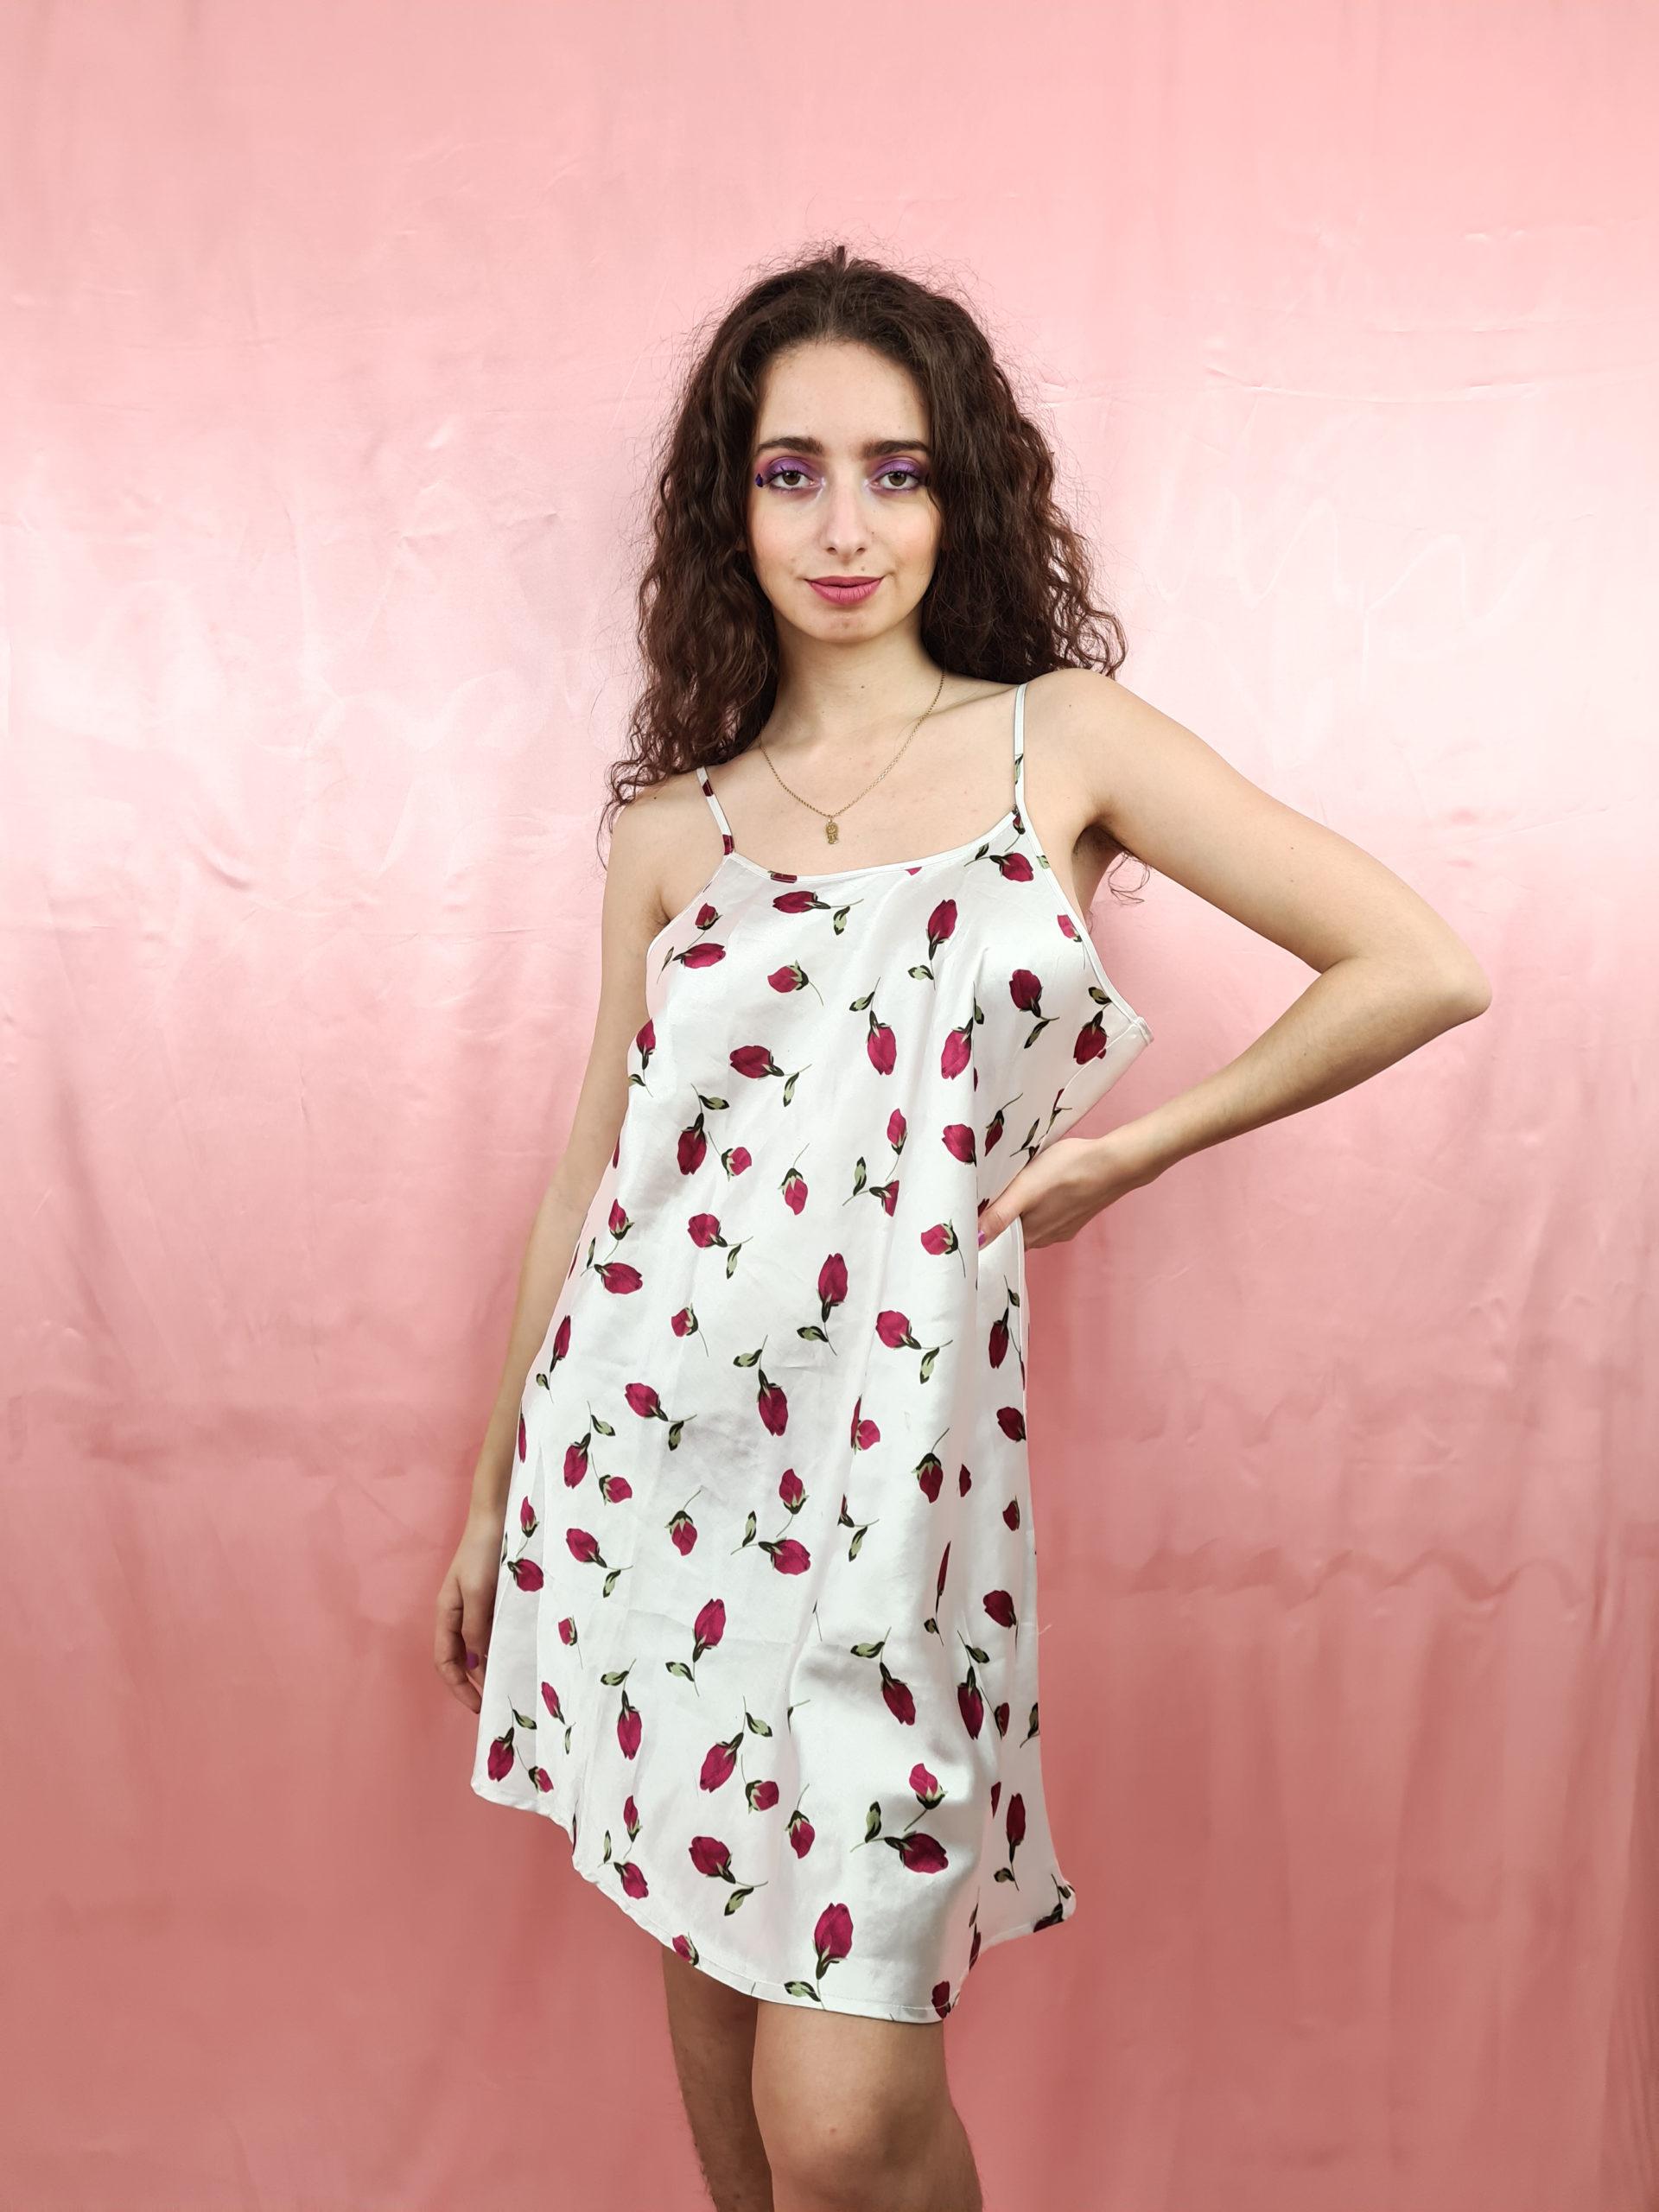 robe nuisette blance motif fleuri (4)